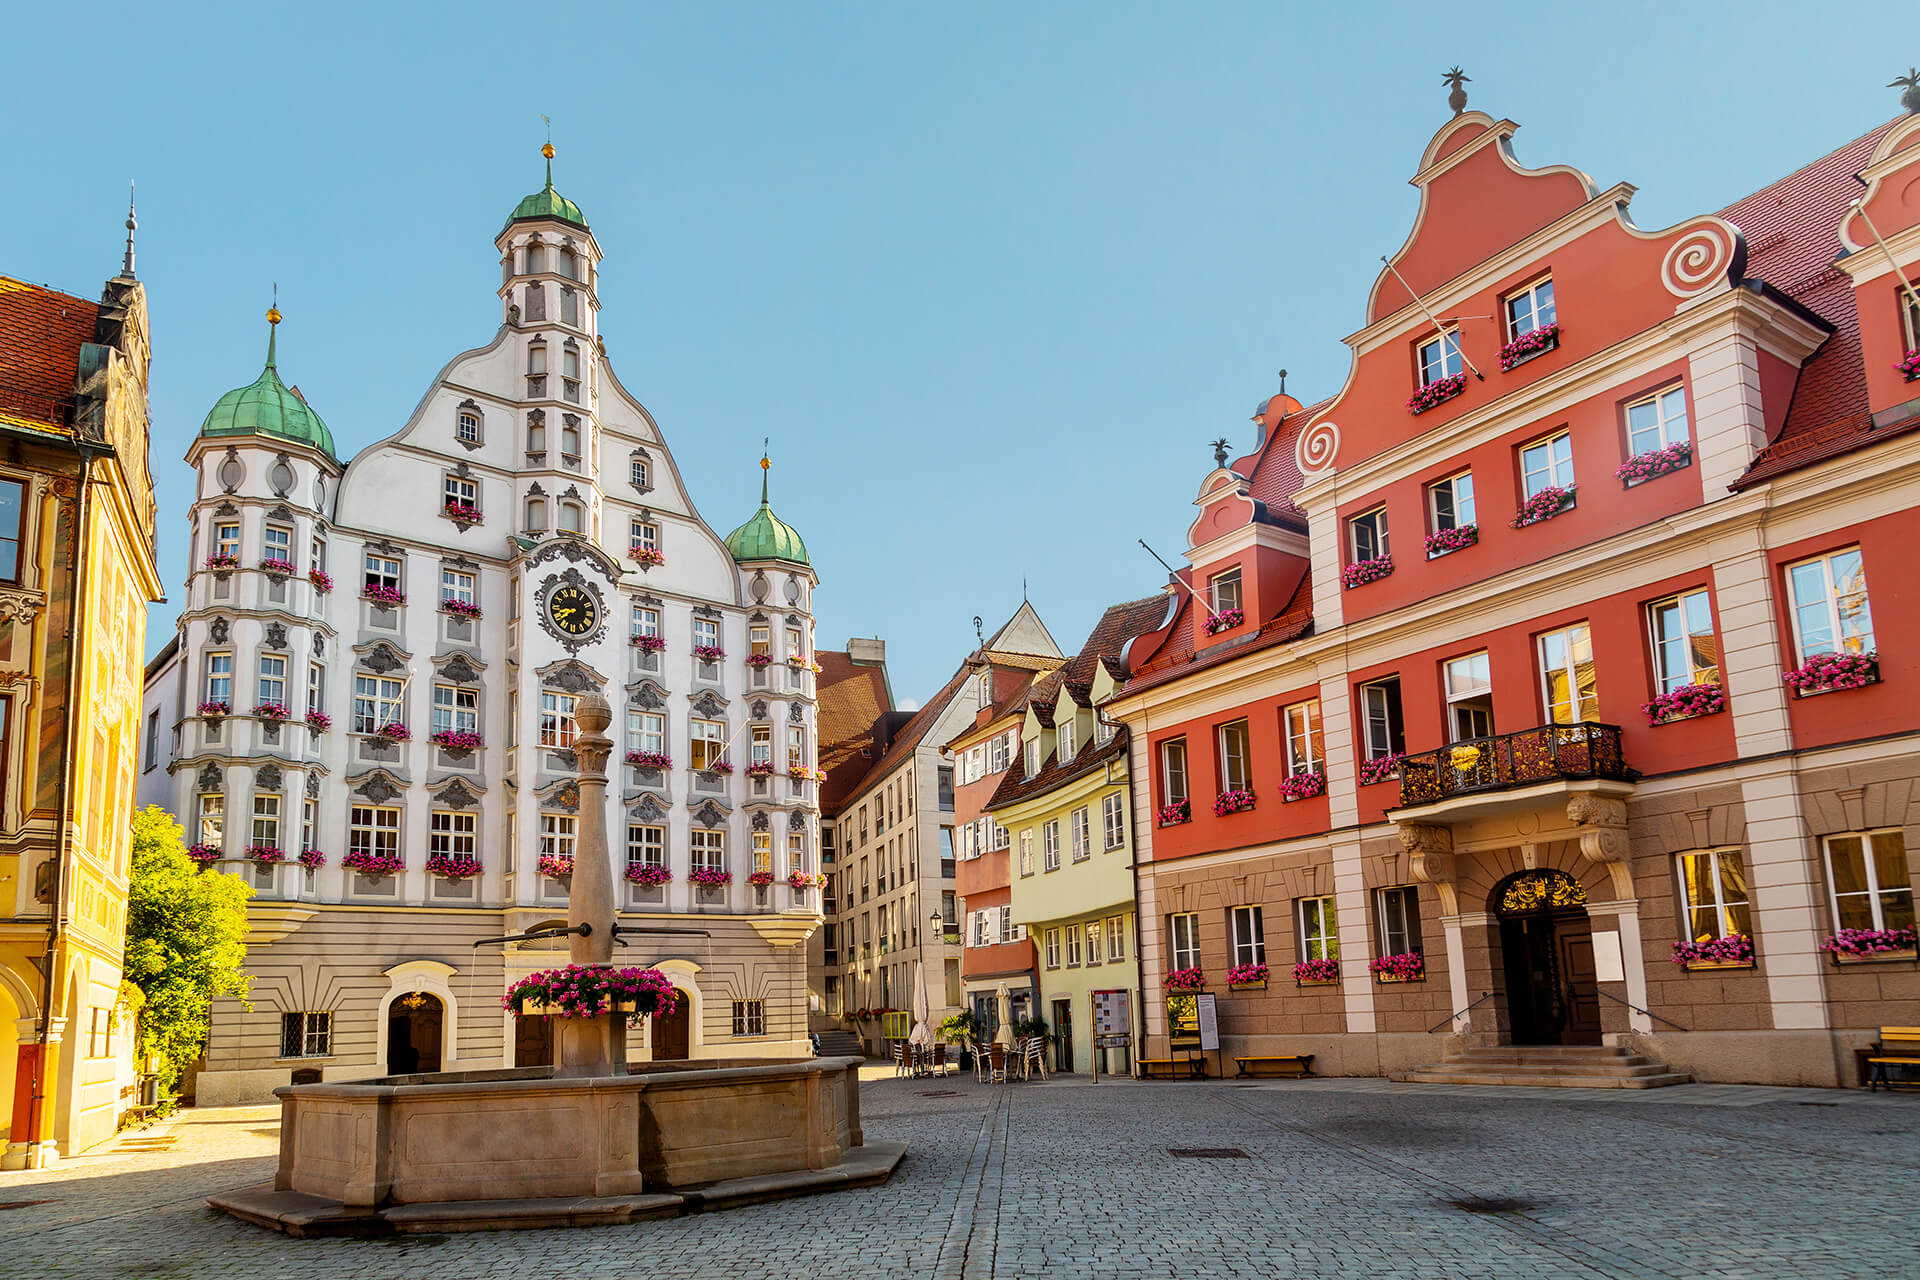 Marktplatz Innenstadt